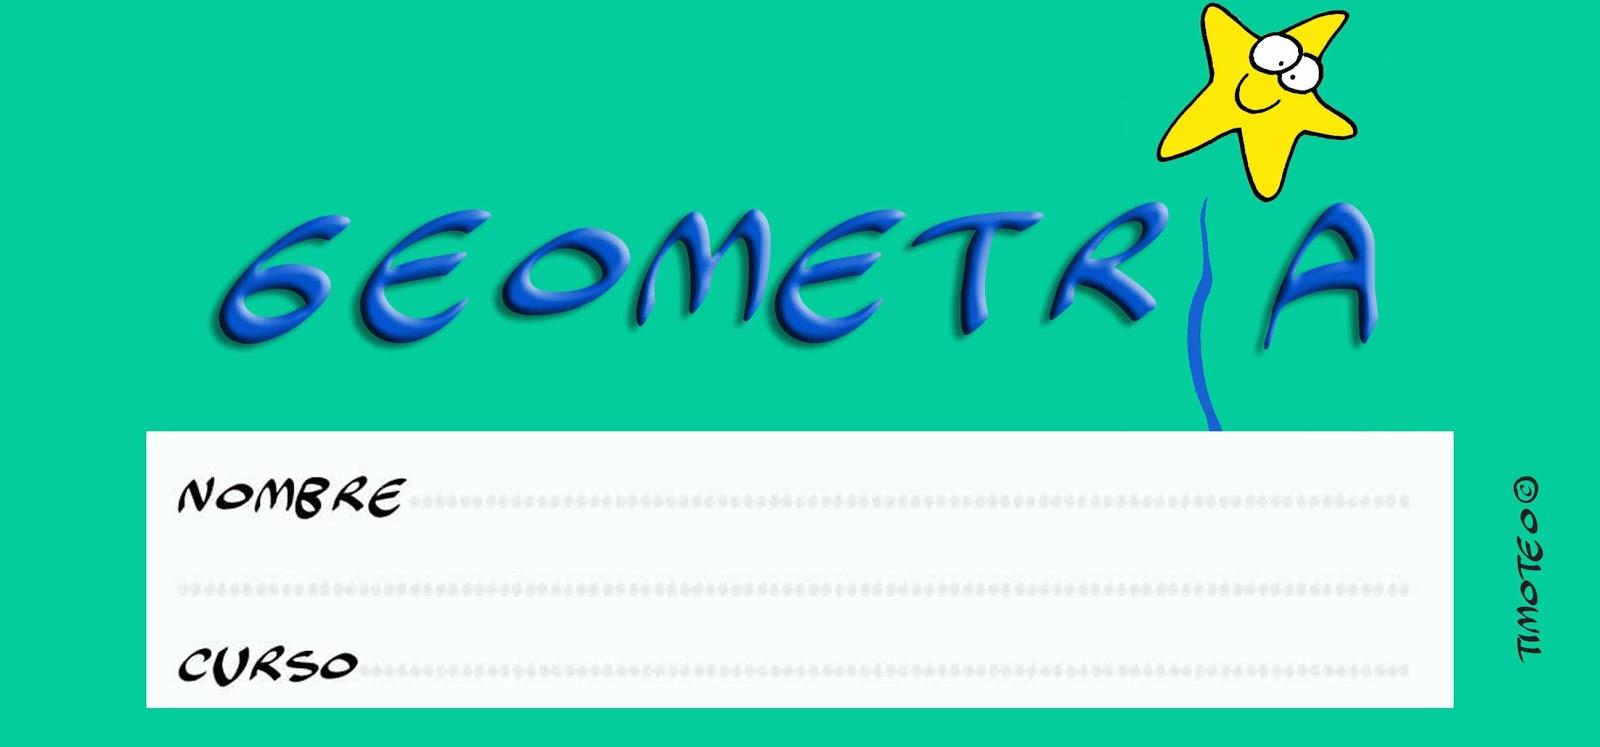 Decoracion De Letras Timoteo